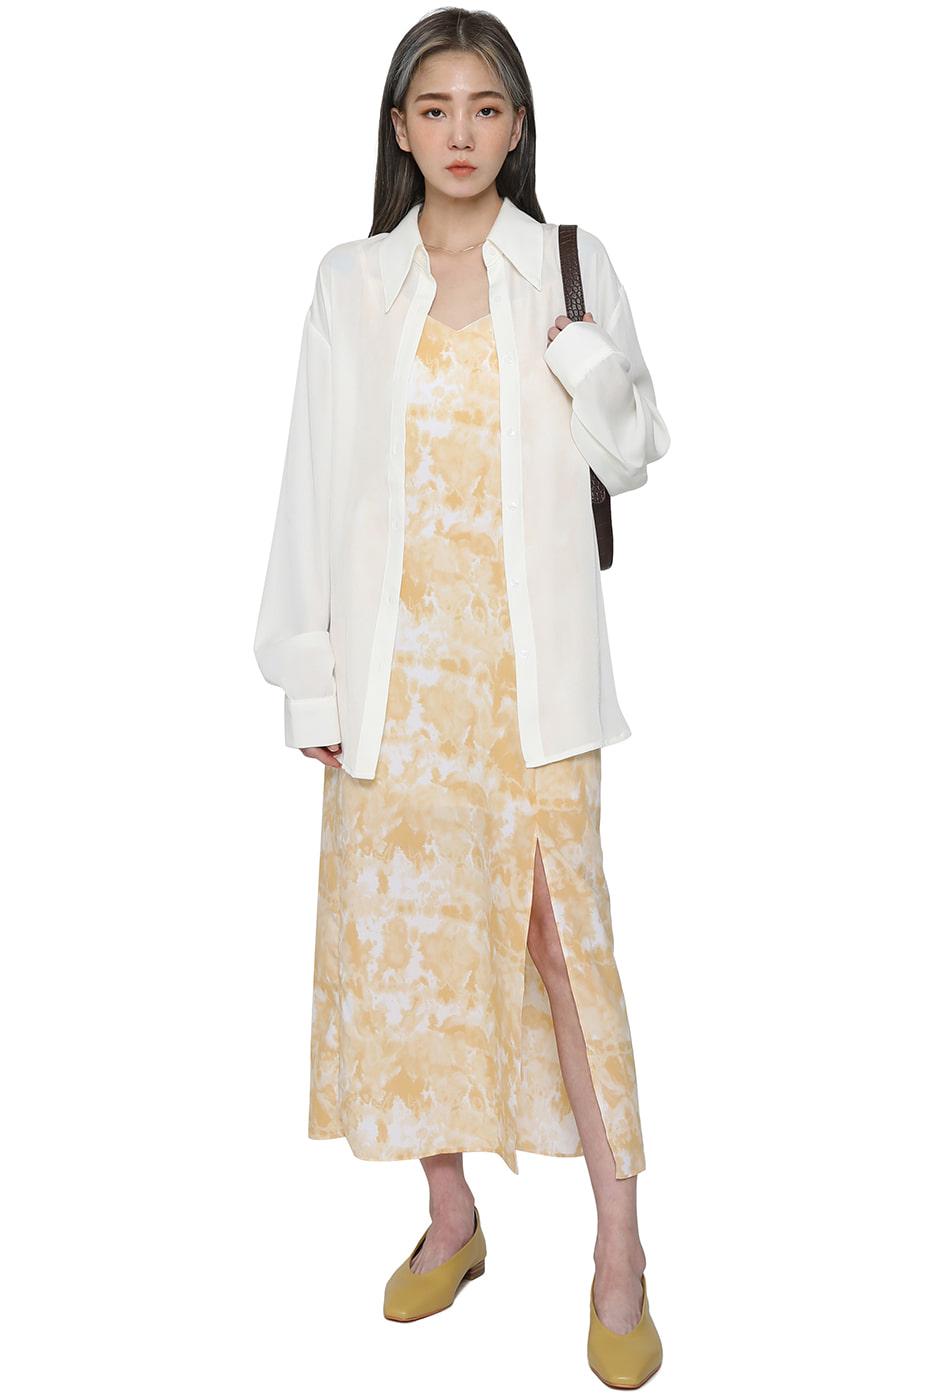 Label sleeveless maxi dress